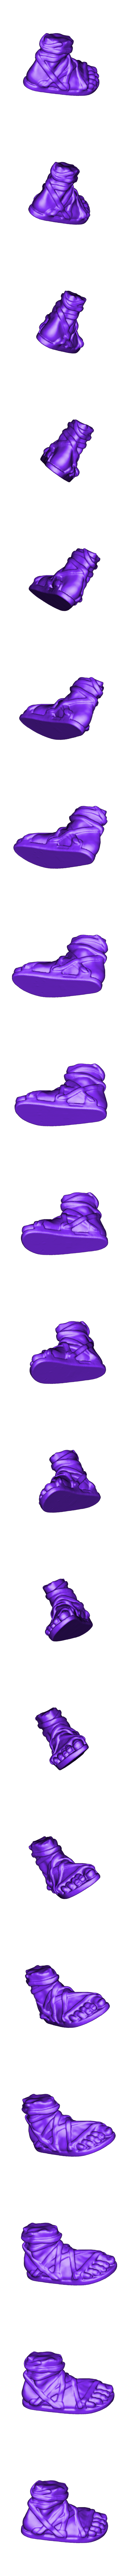 stl_42759e440b62db583f853b3430ffe276_4312.stl Download free STL file The Leg of Achilles • 3D printable model, history3Dprint